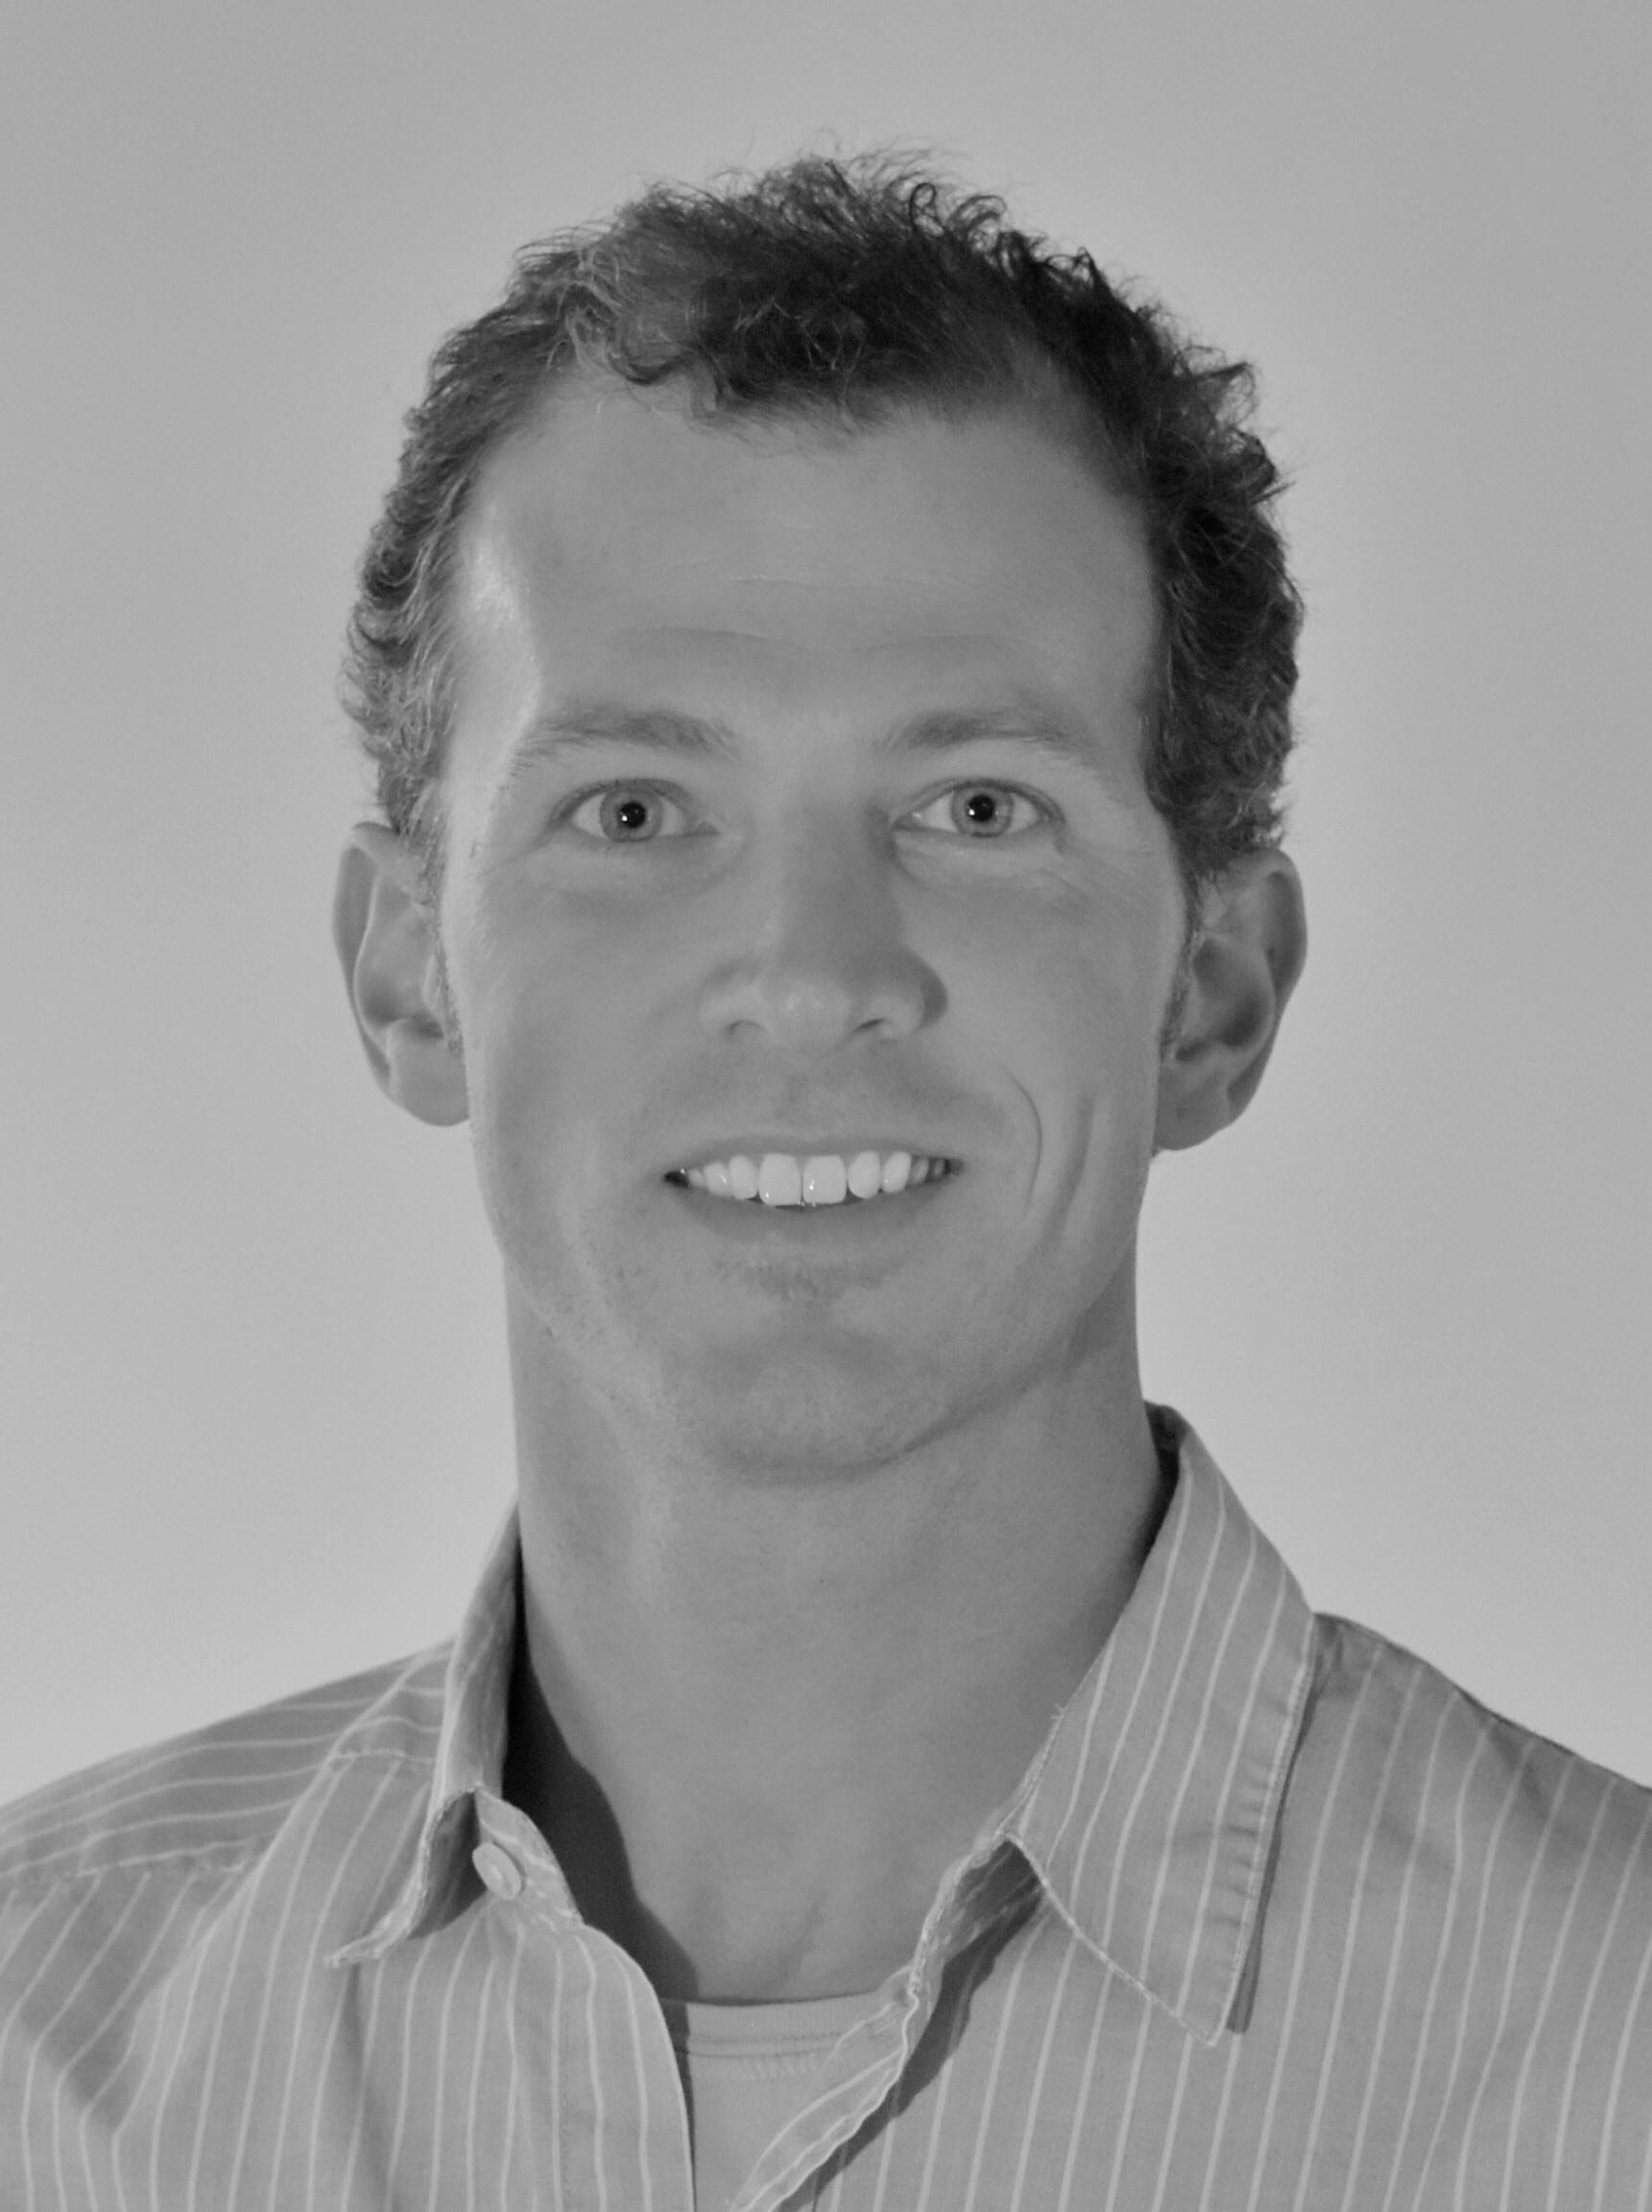 Steven Cahoon